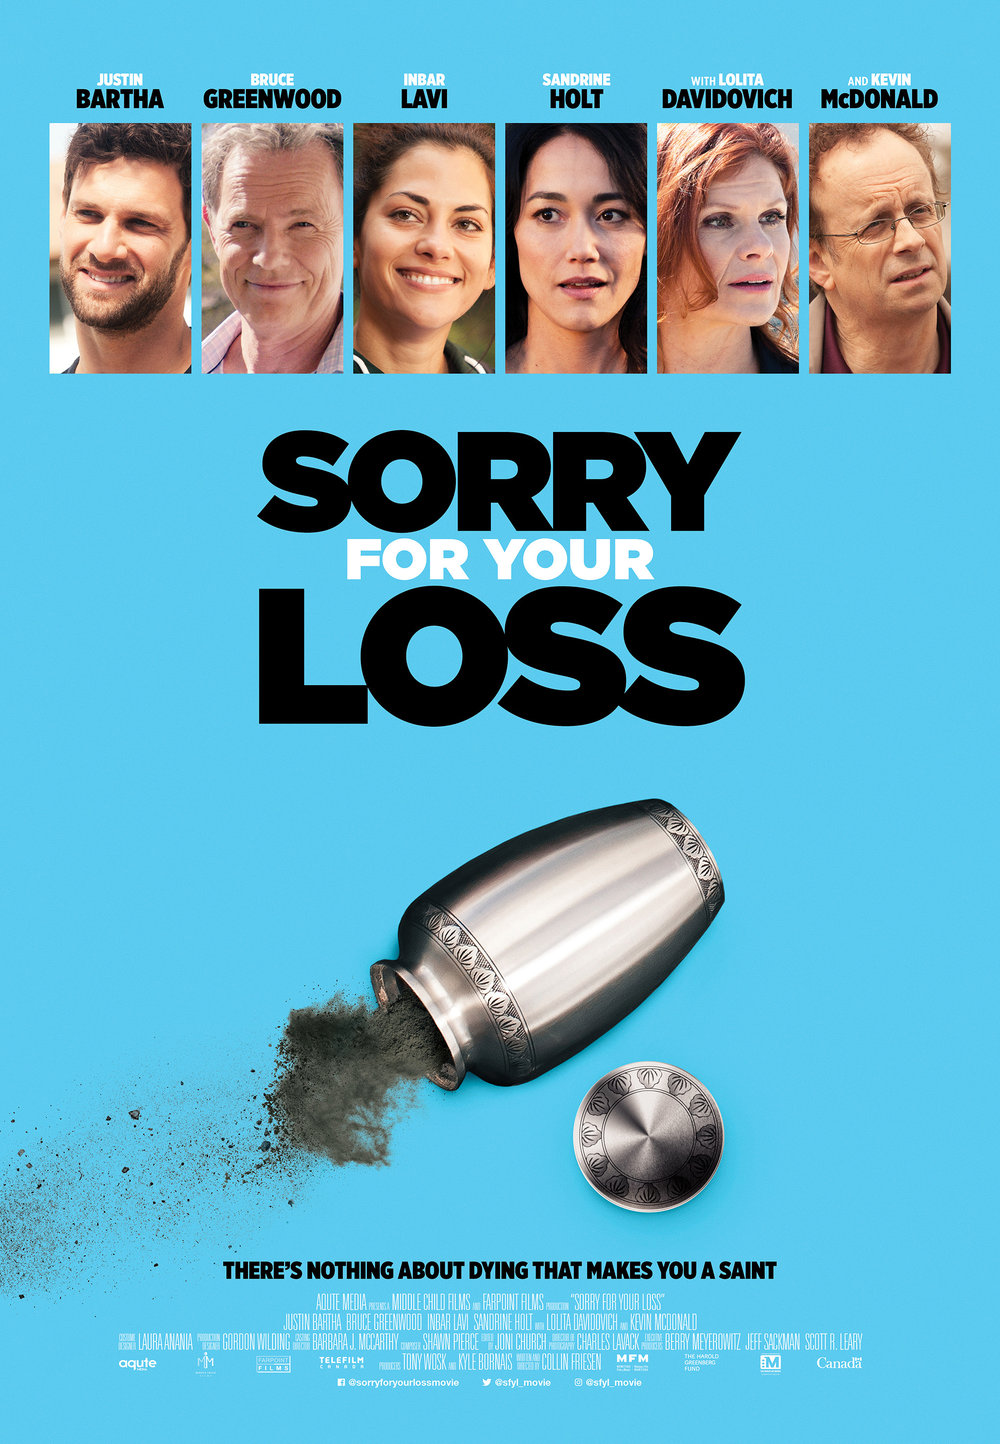 SorryForYourLoss_Poster_27X39_SCREEN.jpg